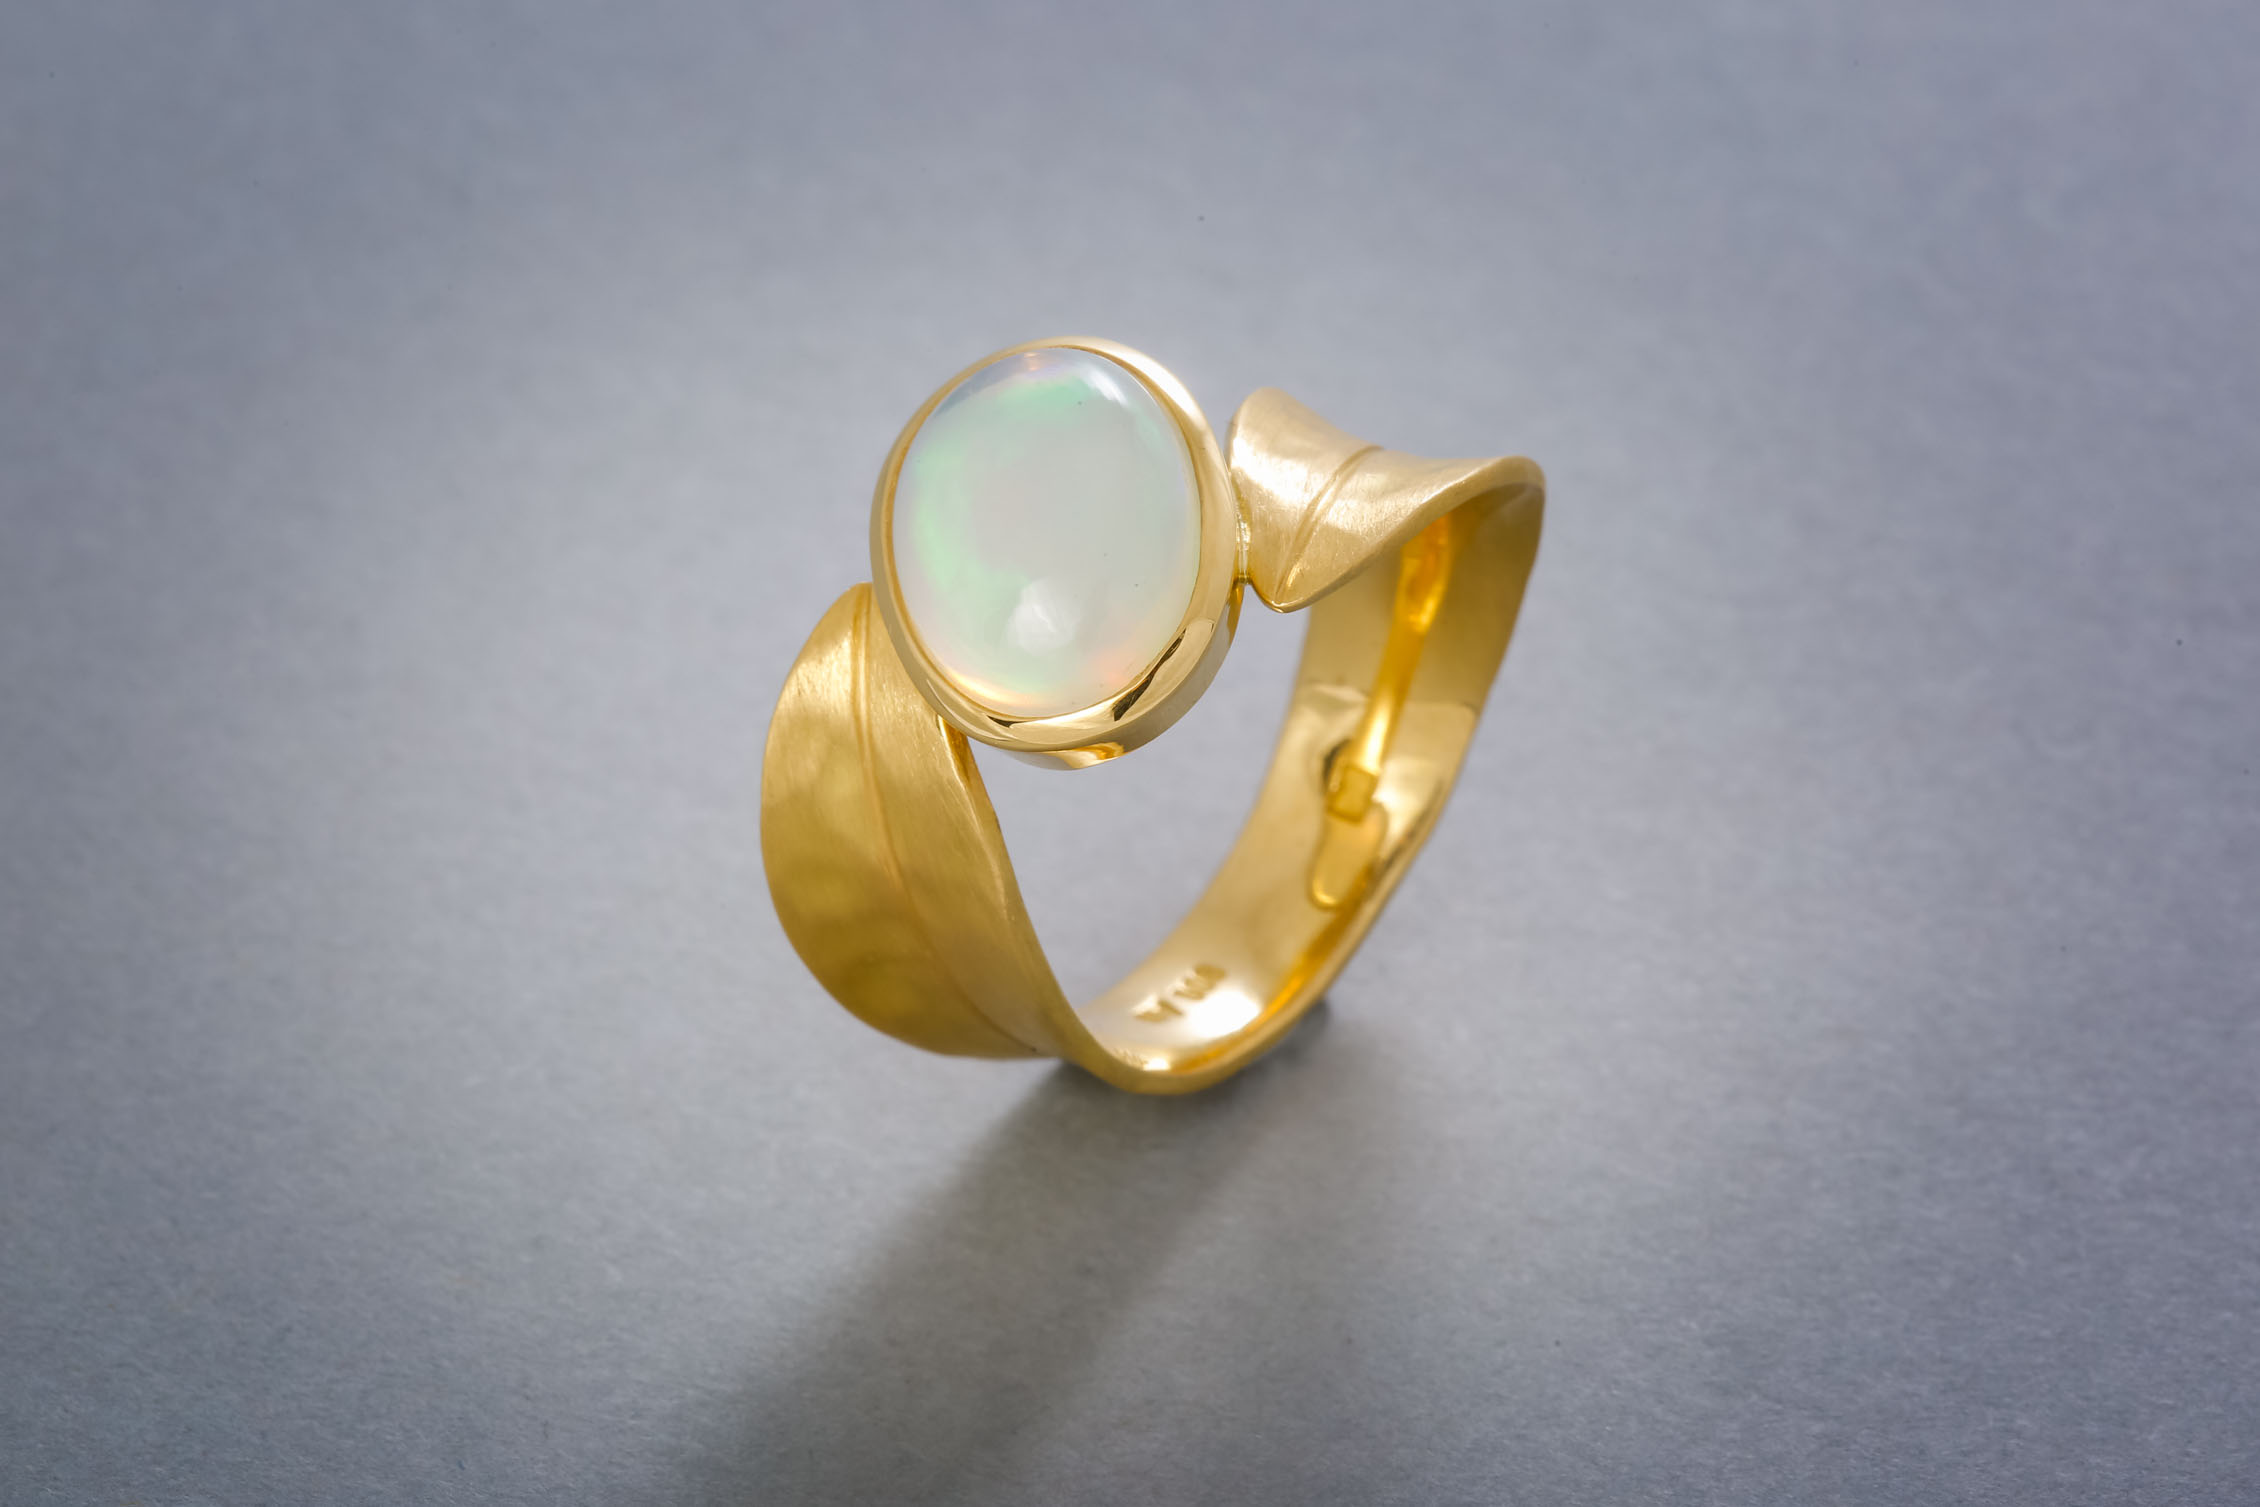 072 Goldring, 21kt, Opal ab € 1368,-